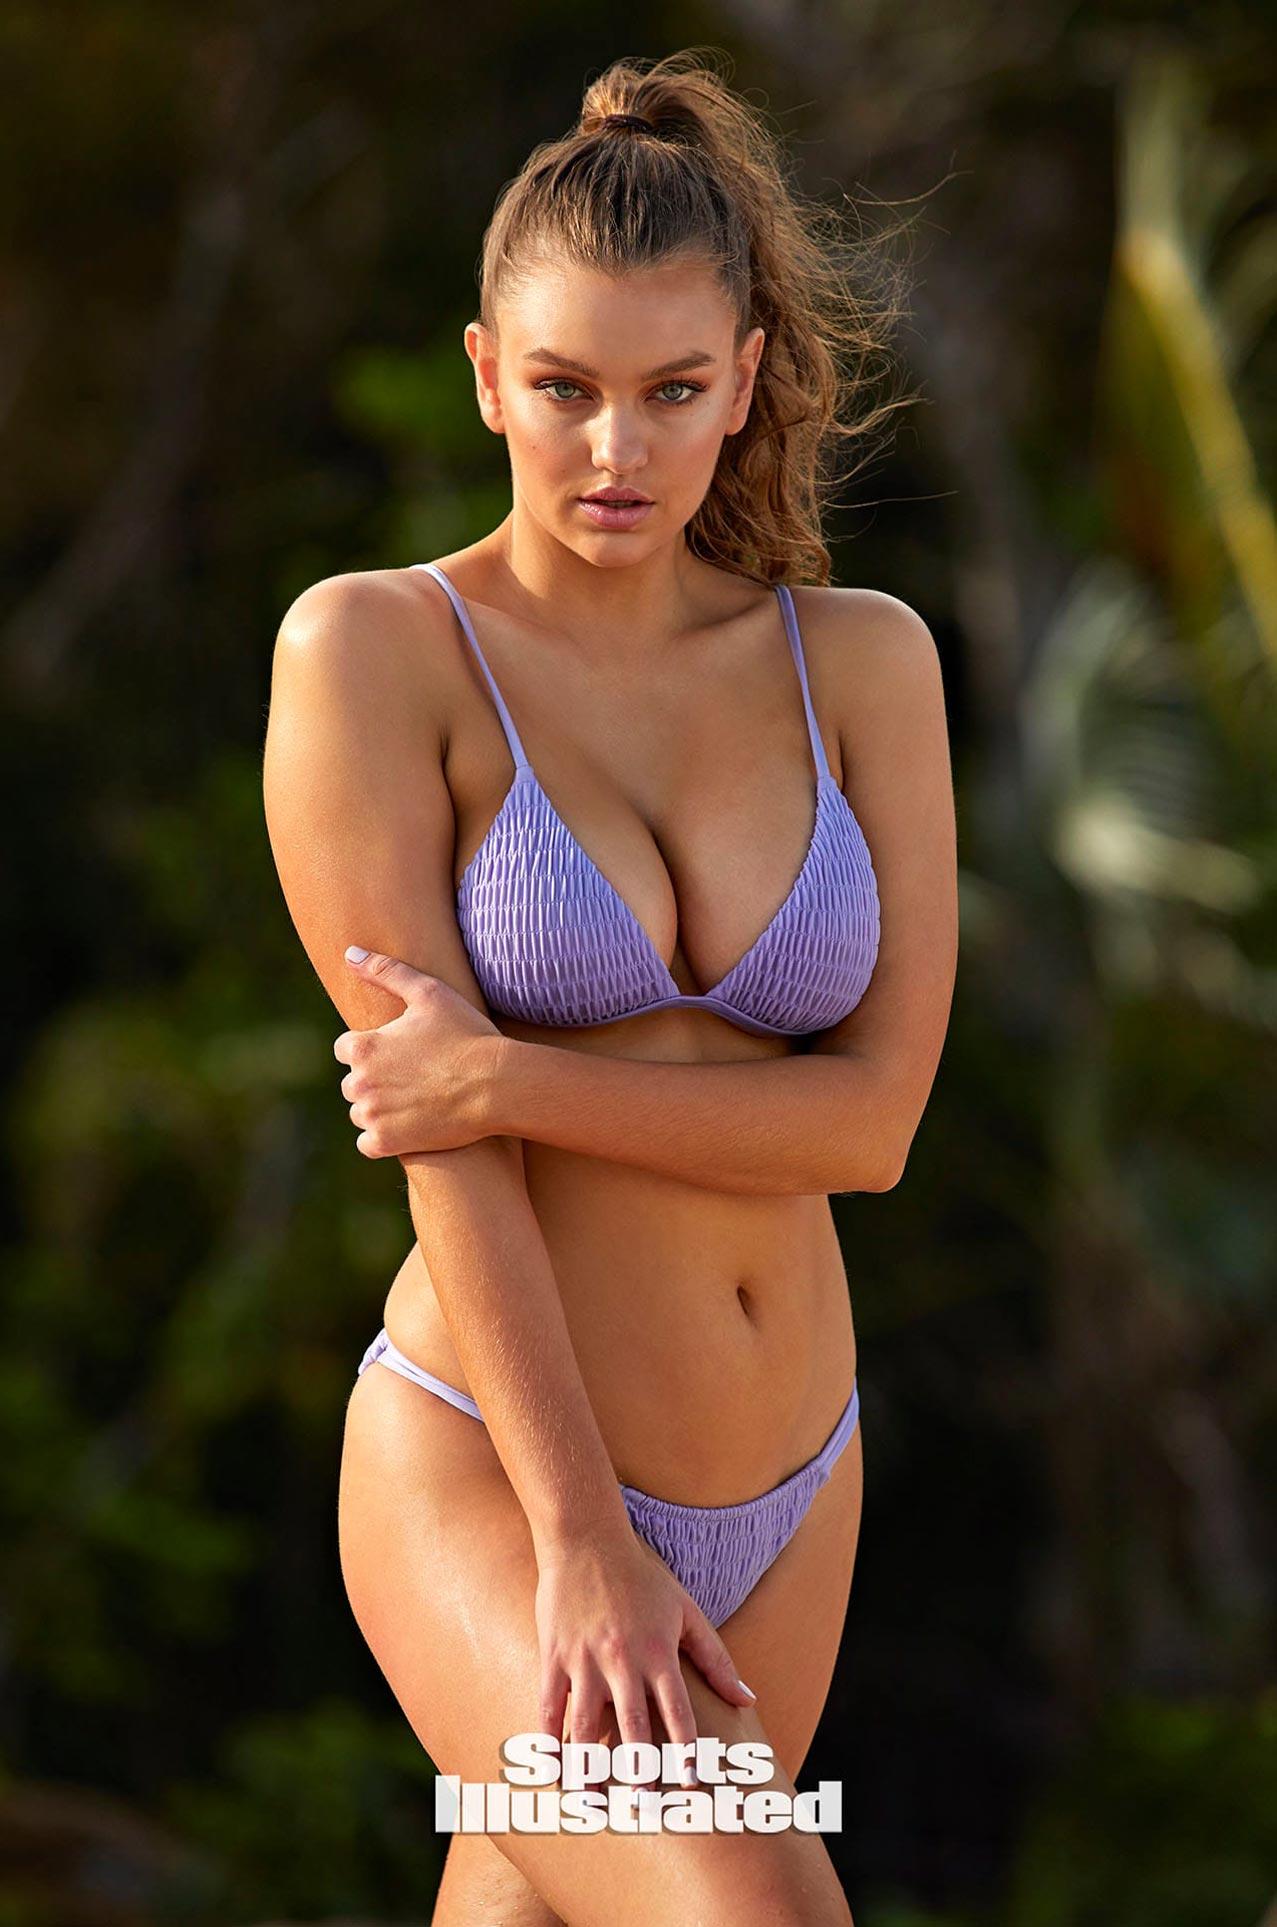 Оливия Брауэр в каталоге купальников Sports Illustrated Swimsuit 2020 / фото 17